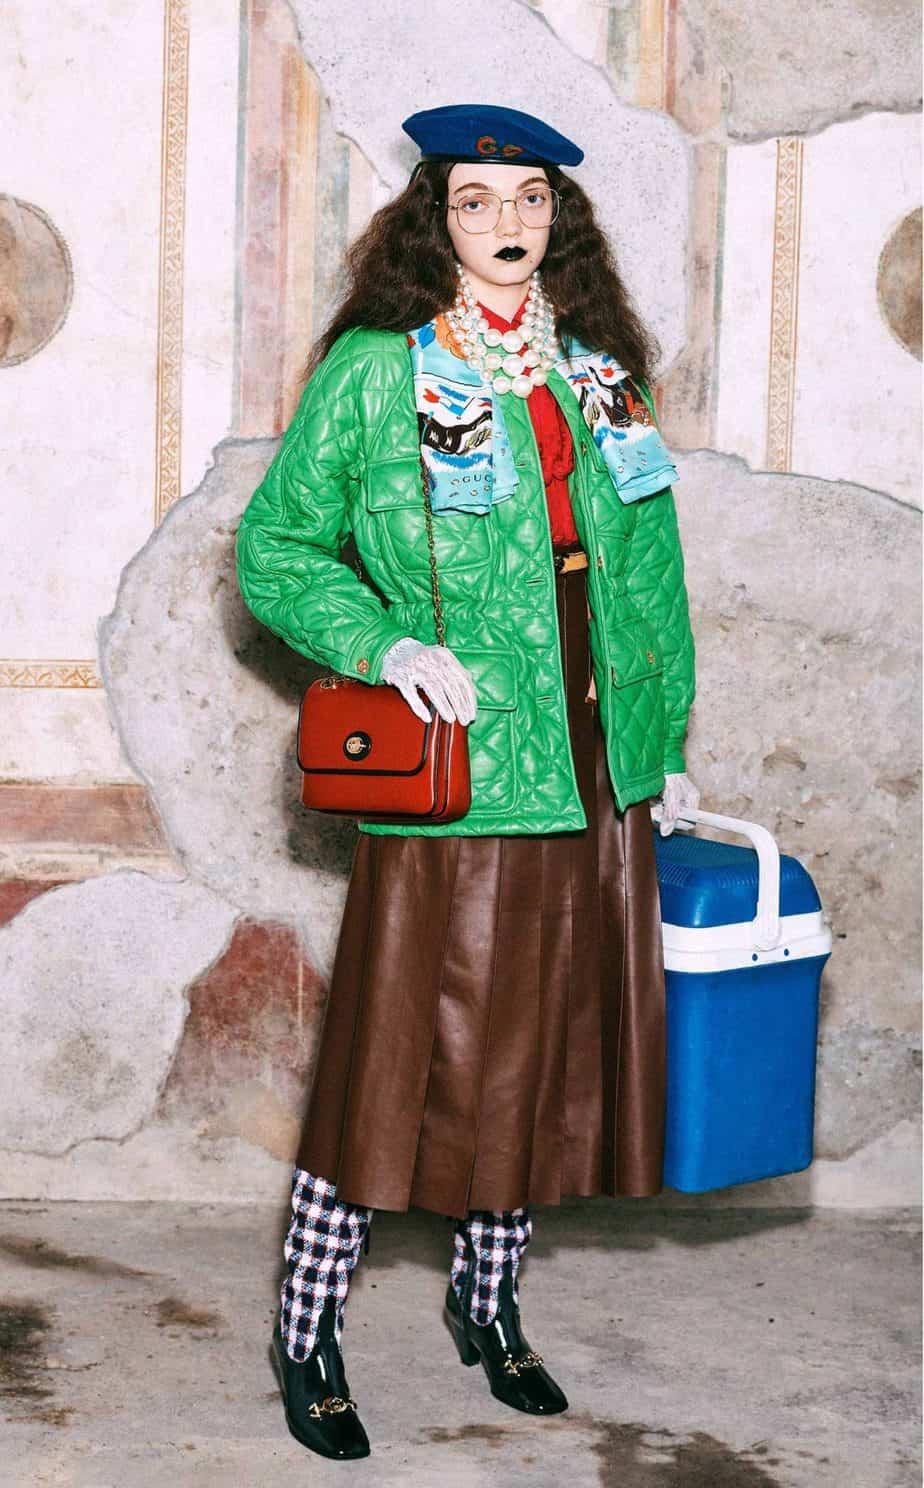 GUCCI, FALL 2019. WOMEN'S FASHION, Photographer Harmony Korine, Art Director, Christopher Simmonds - 89